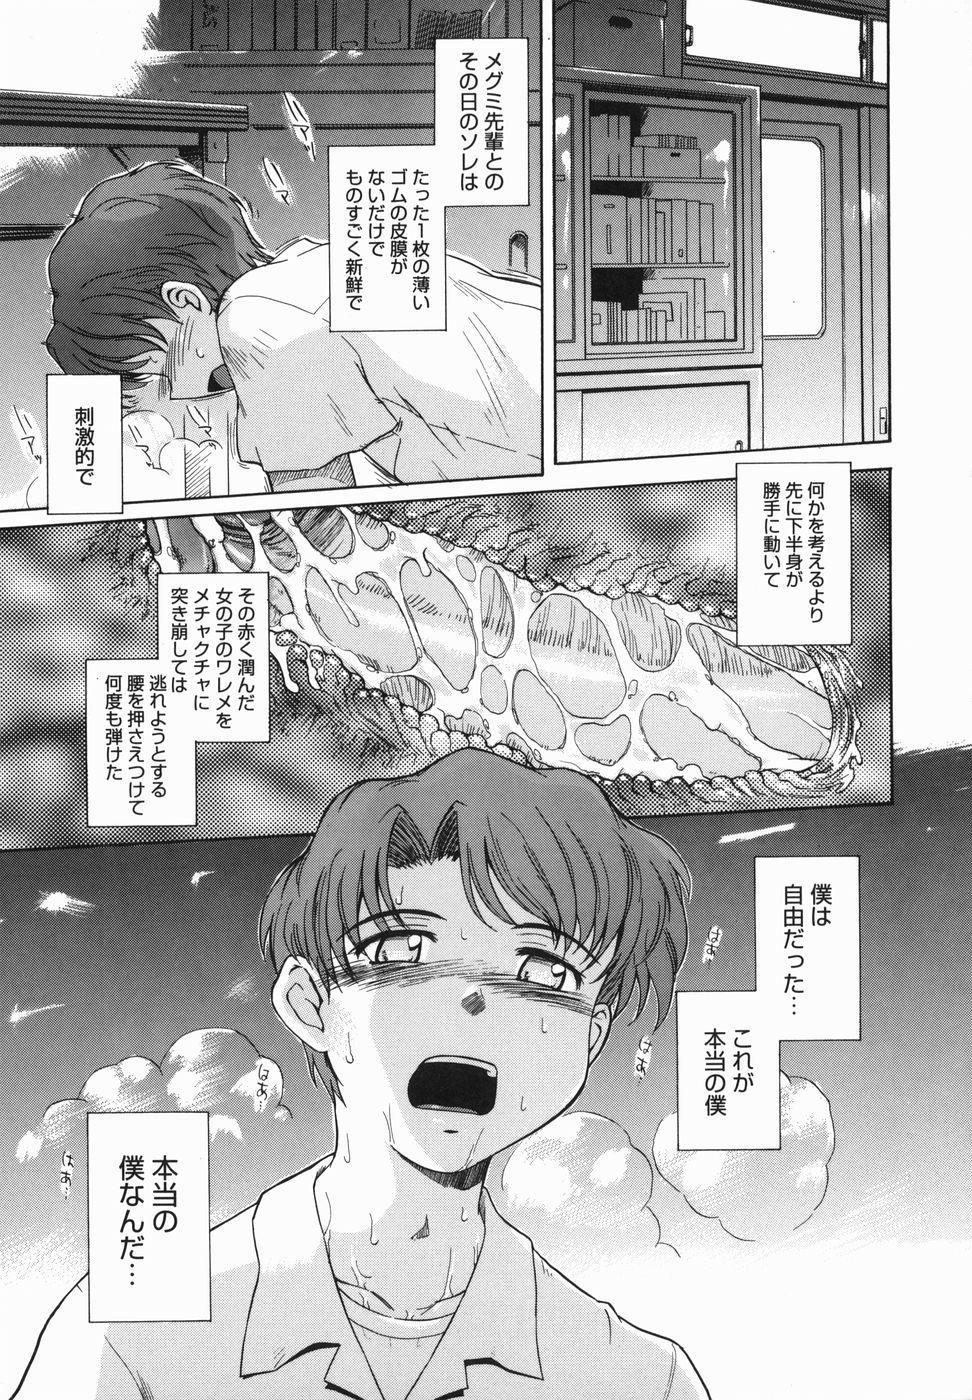 ♭38℃ Loveberry Twins 28